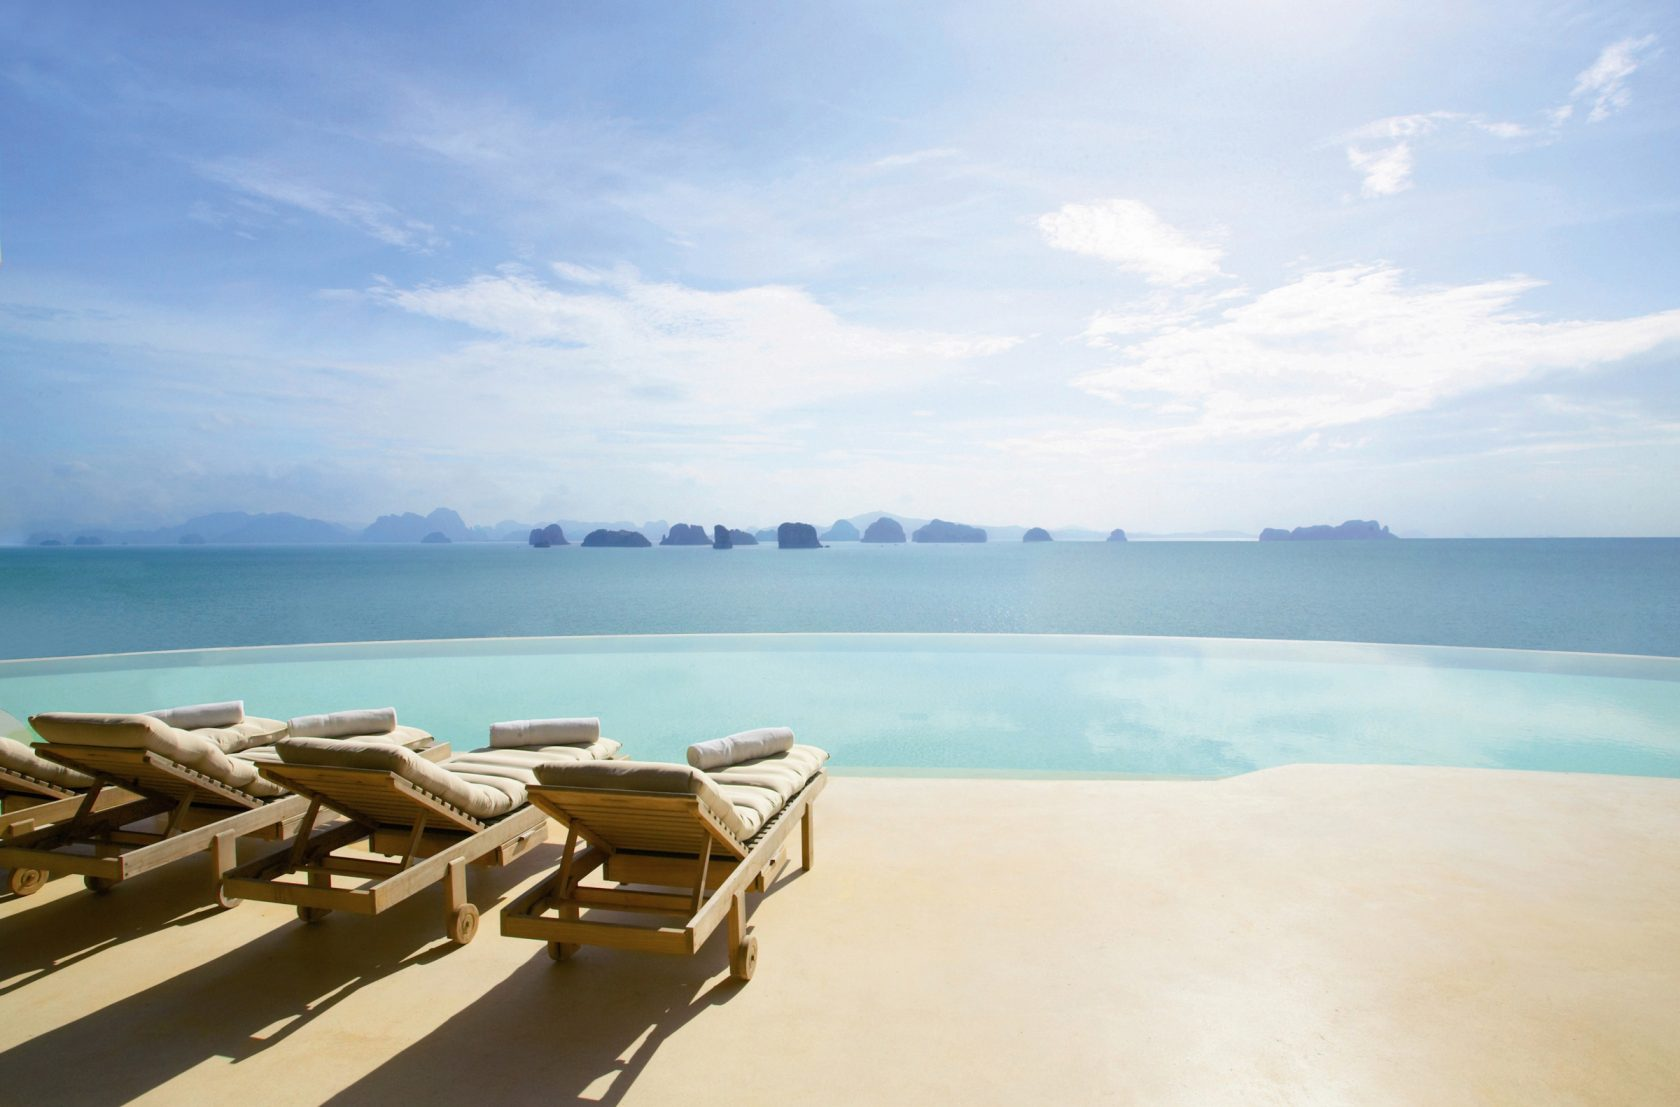 Six Senses Hotels Resorts Spas: Top-Luxushotels